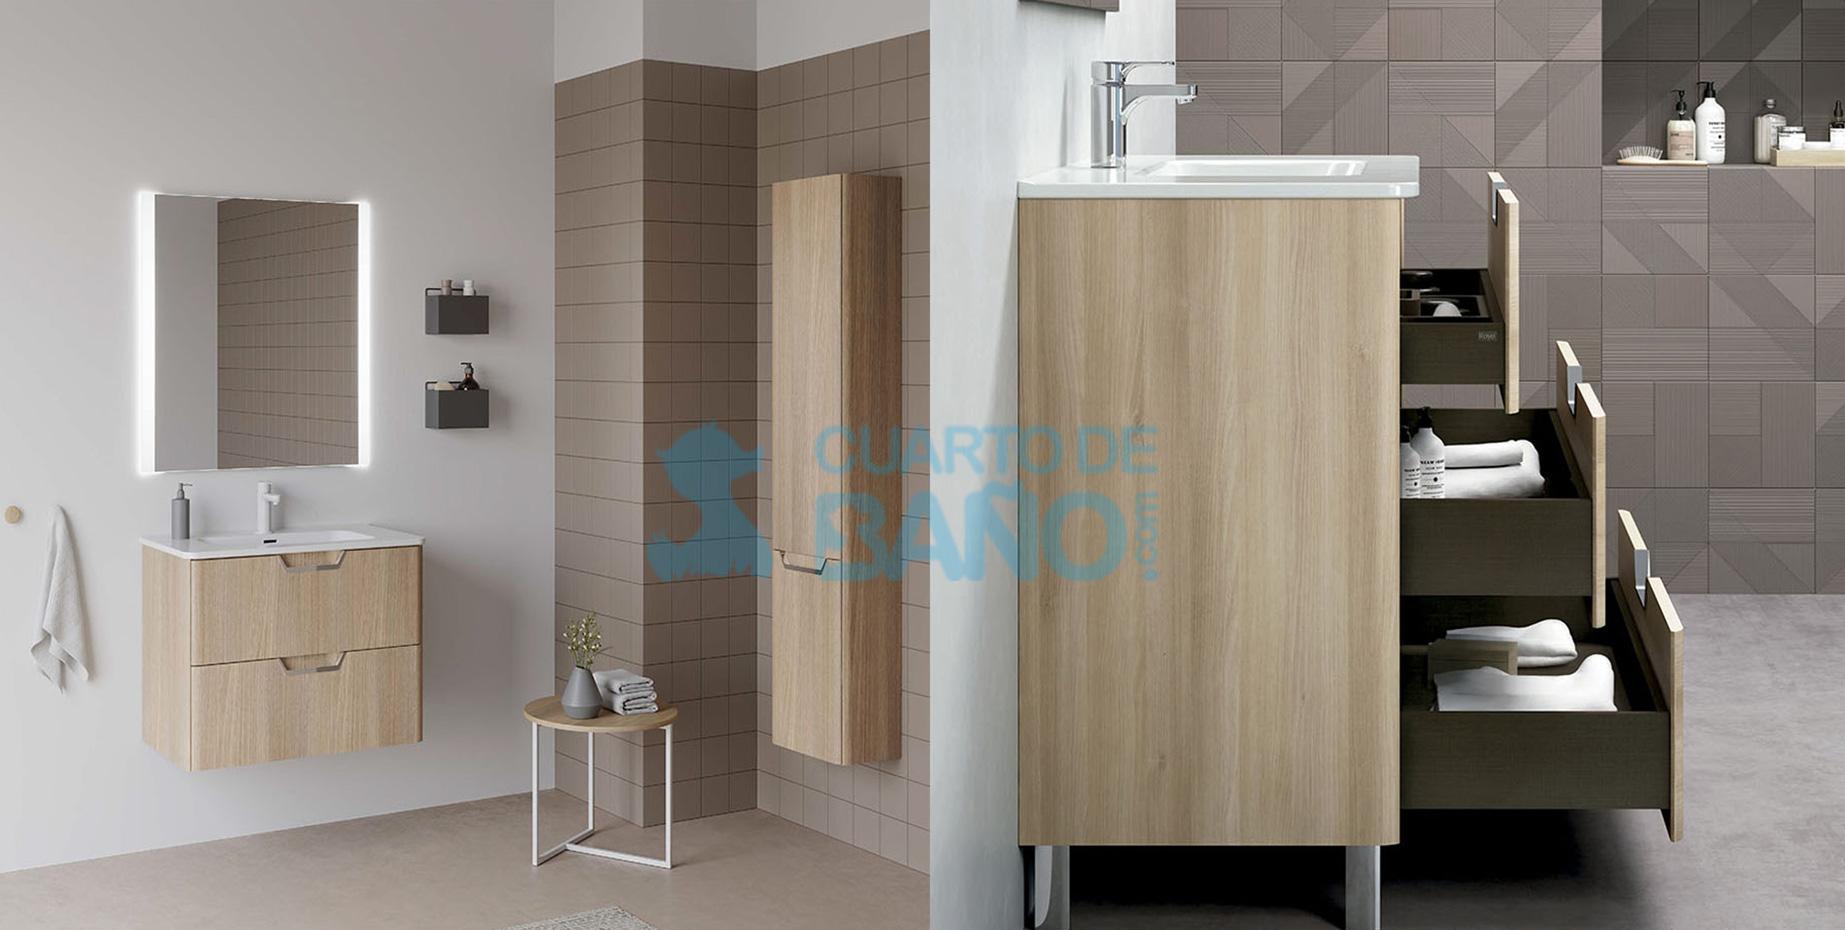 Muebles de baño LIFE de Royo Group